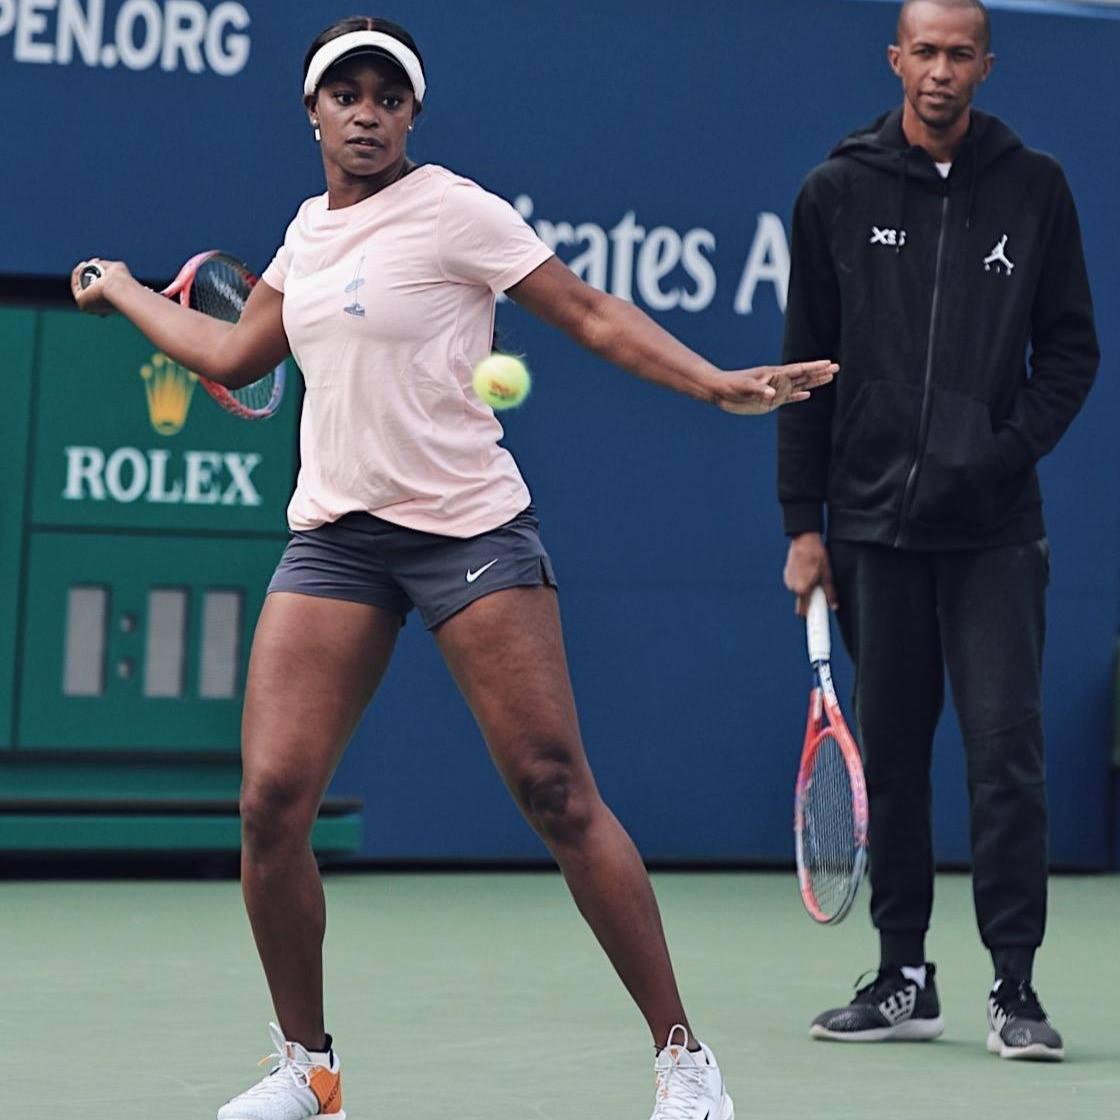 US Open Tennis Grand Slam Sponsors Partners Advertisements Logos Suppliers Rolex Watch